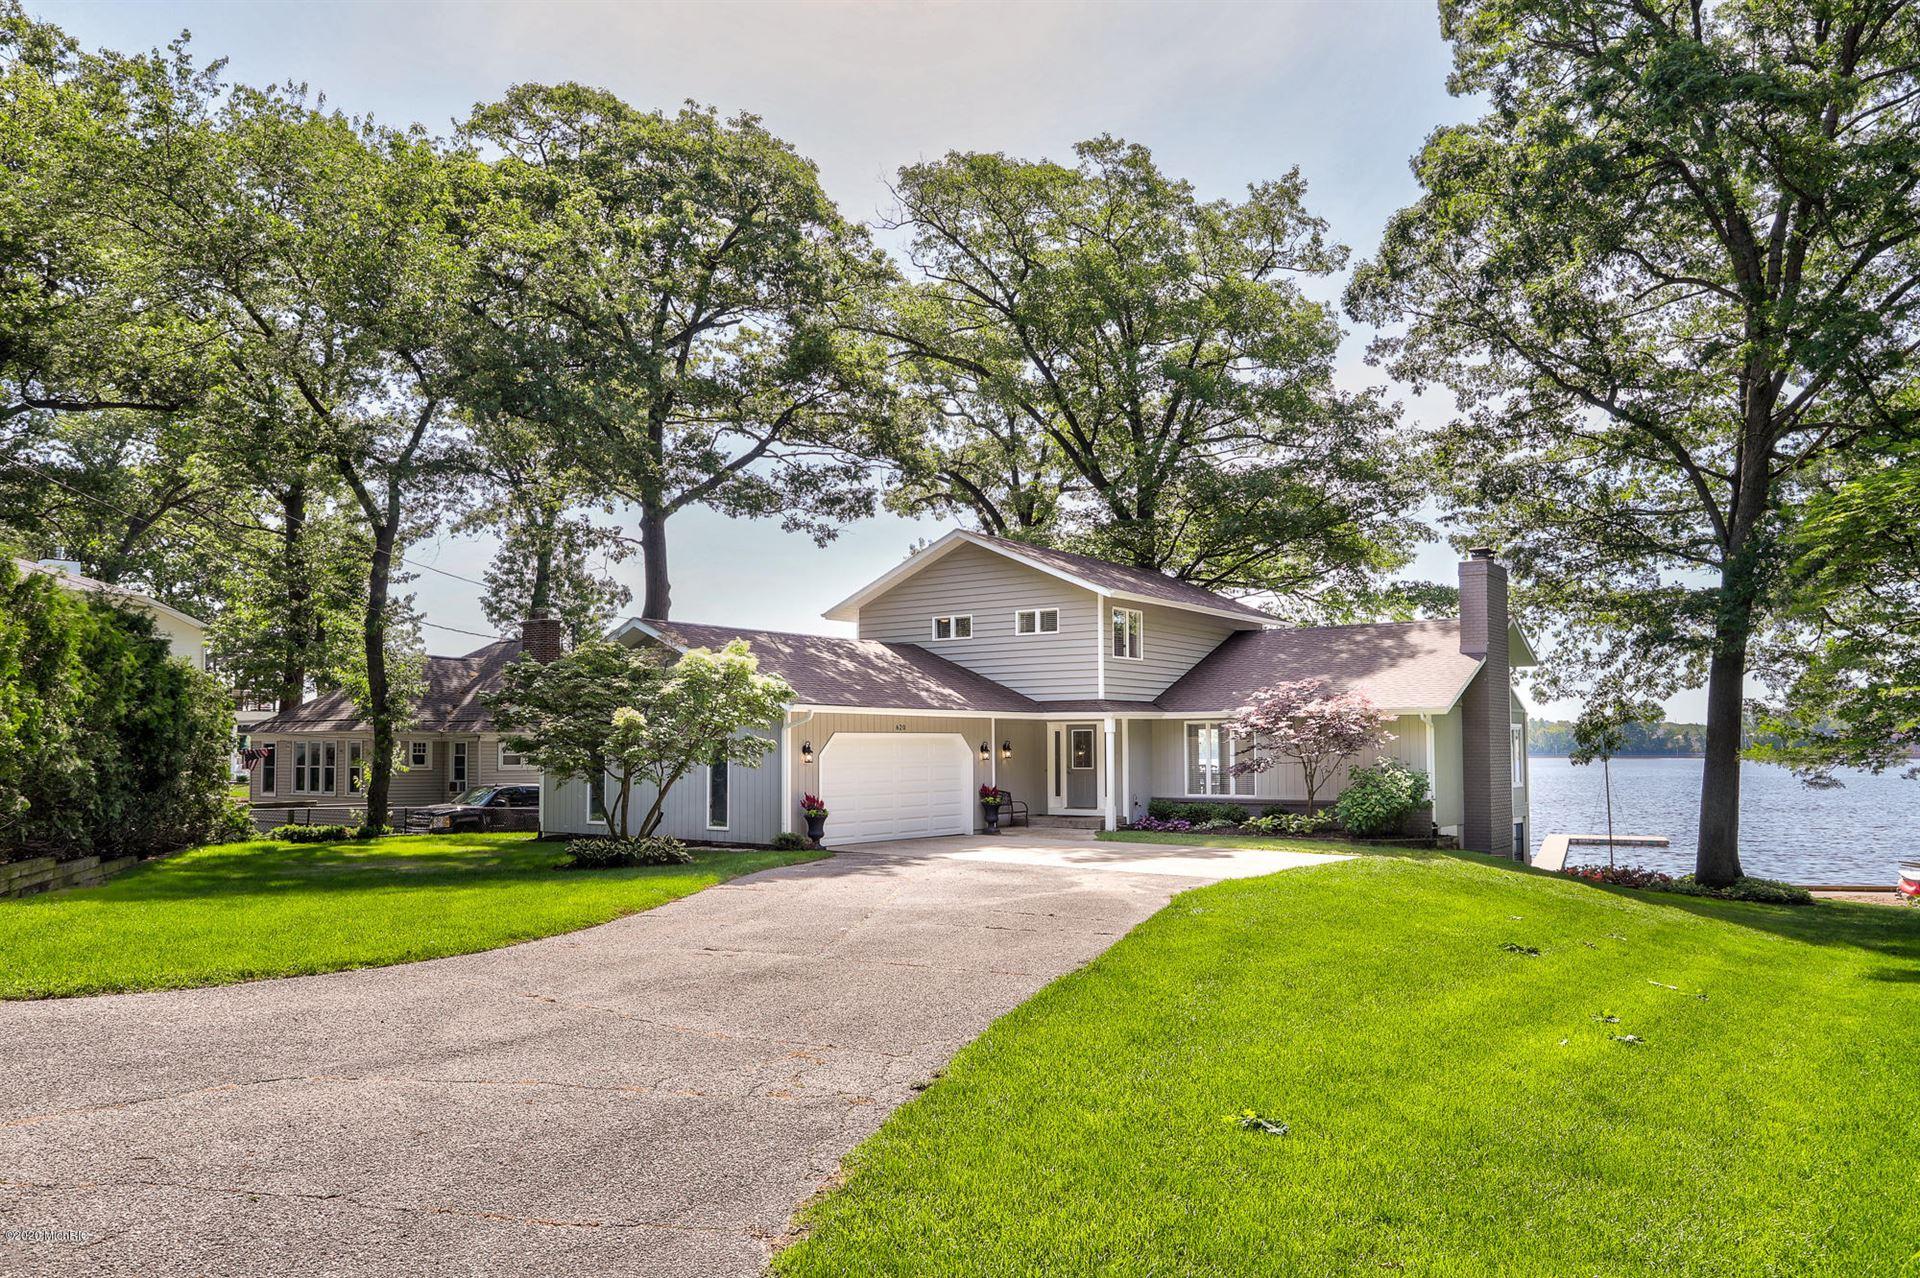 620 Lawn Avenue, Holland, MI 49424 - MLS#: 20021506